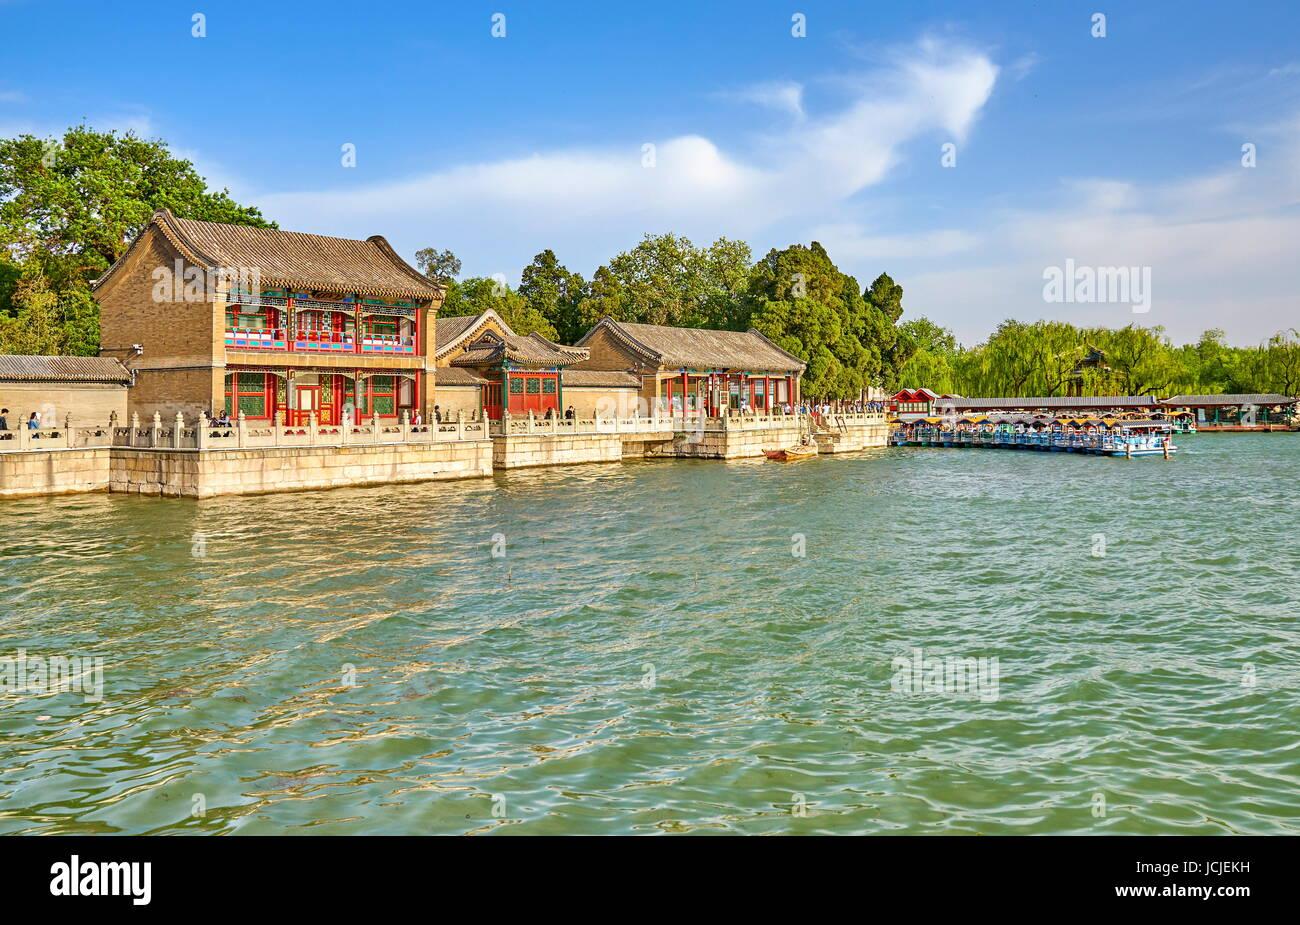 Kunming Lake near Summer Palace, Beijing, China - Stock Image